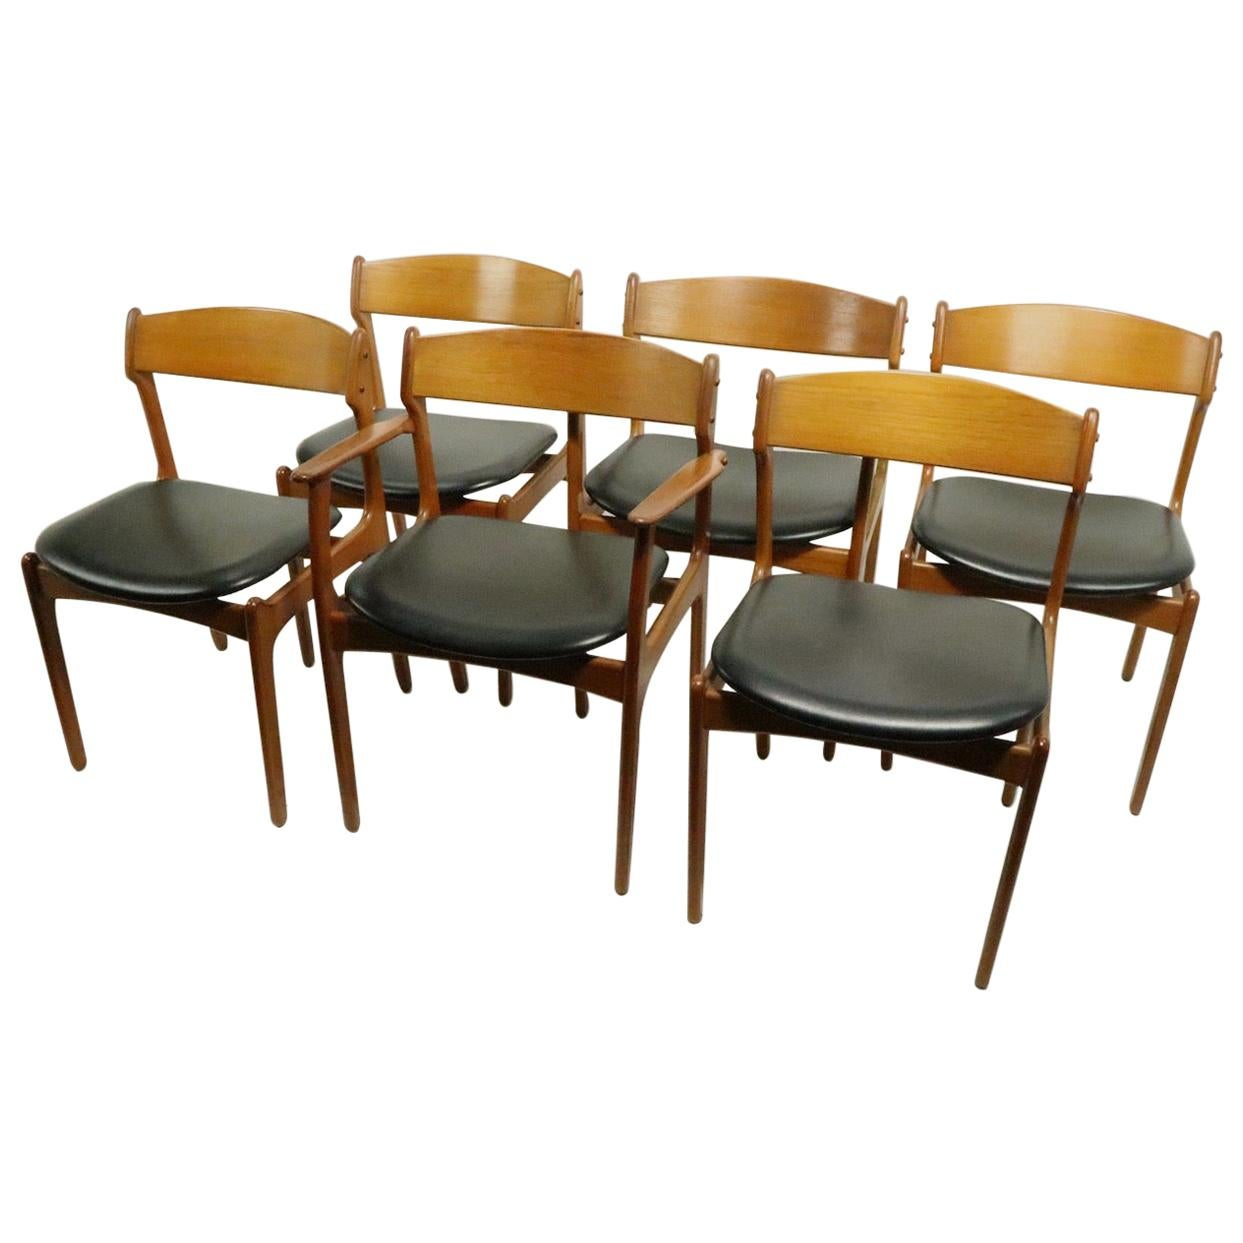 Set of 6 Danish Dining Chairs by Erik Buch for Oddense Maskinsnedkeri